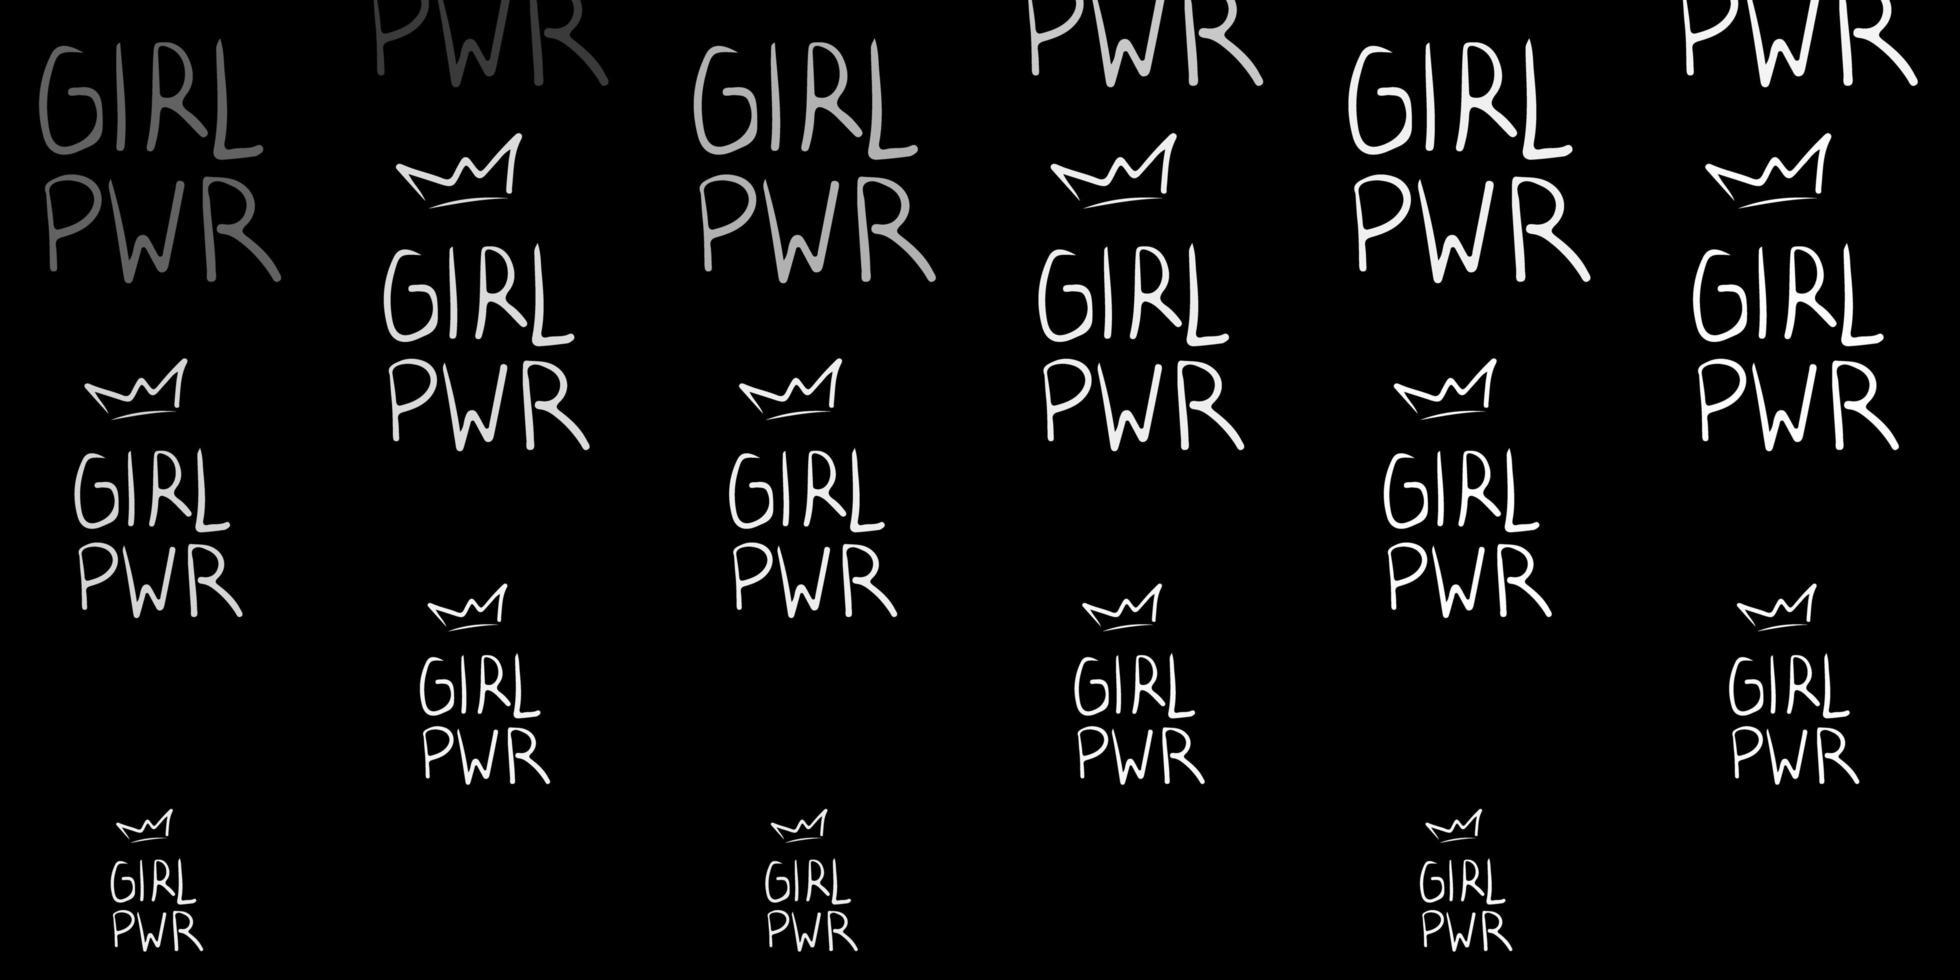 fundo cinza escuro com símbolos de mulheres. vetor